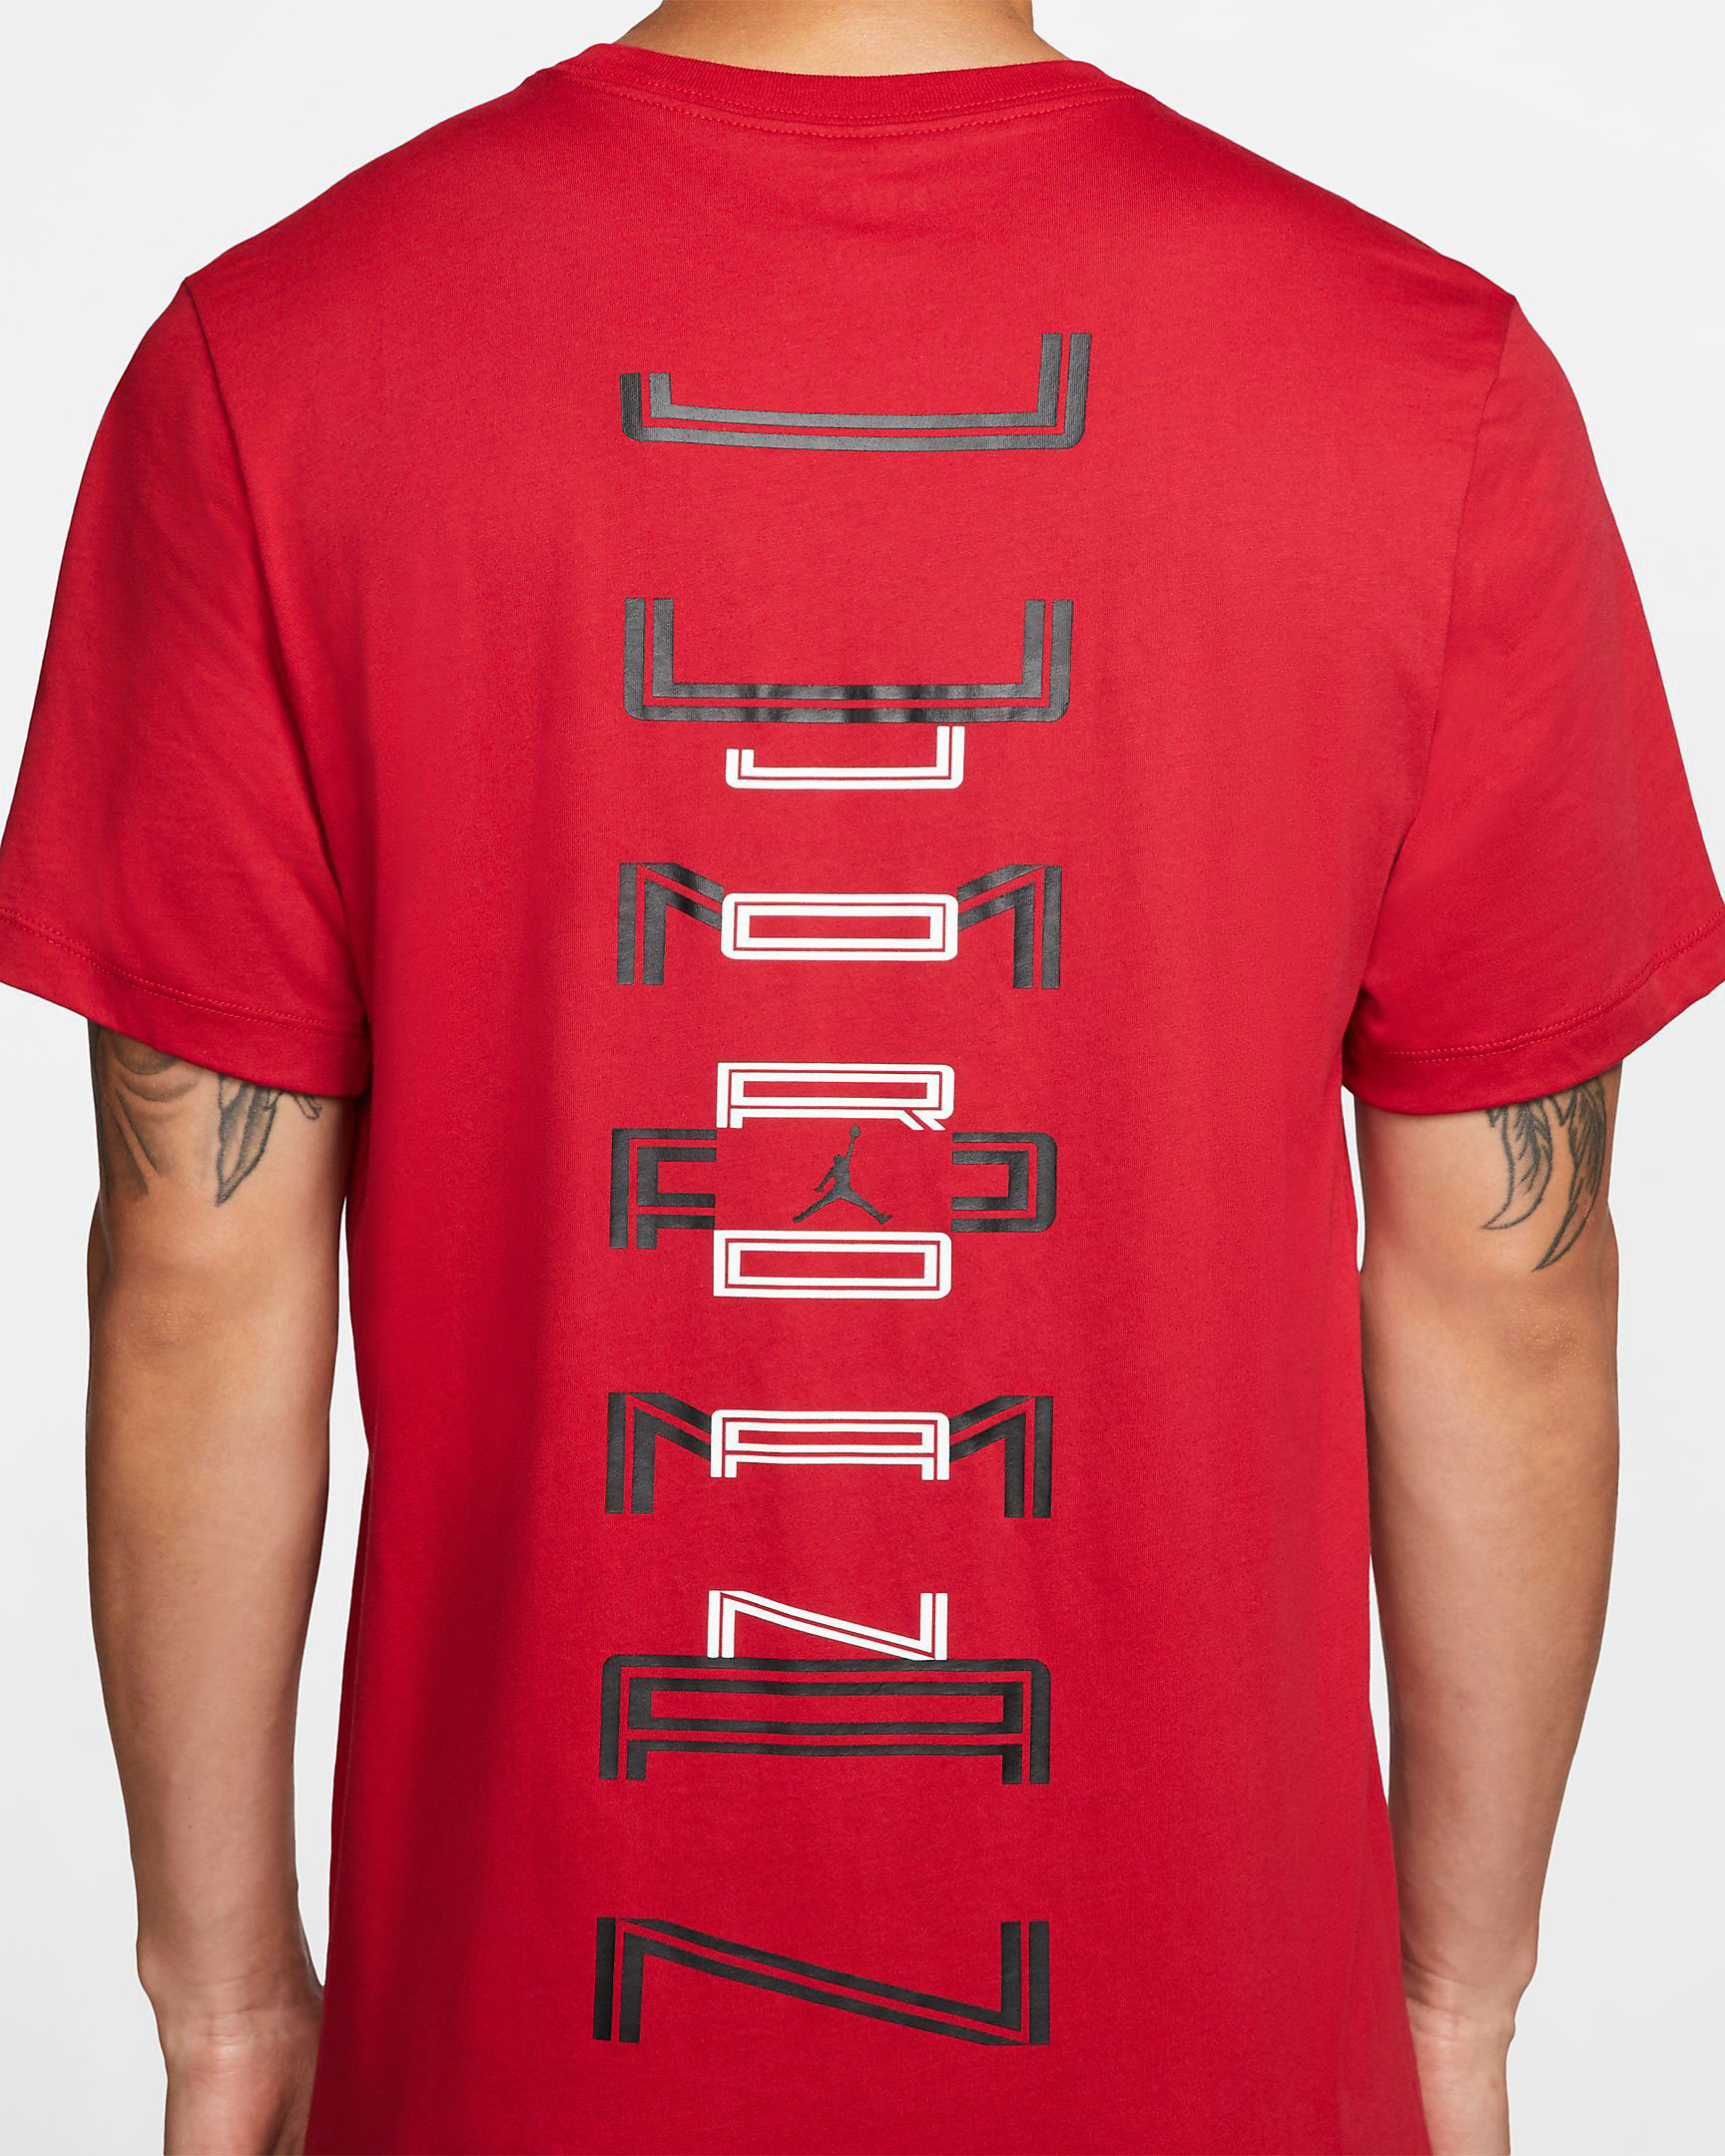 air-jordan-11-bred-sneaker-tee-shirt-5